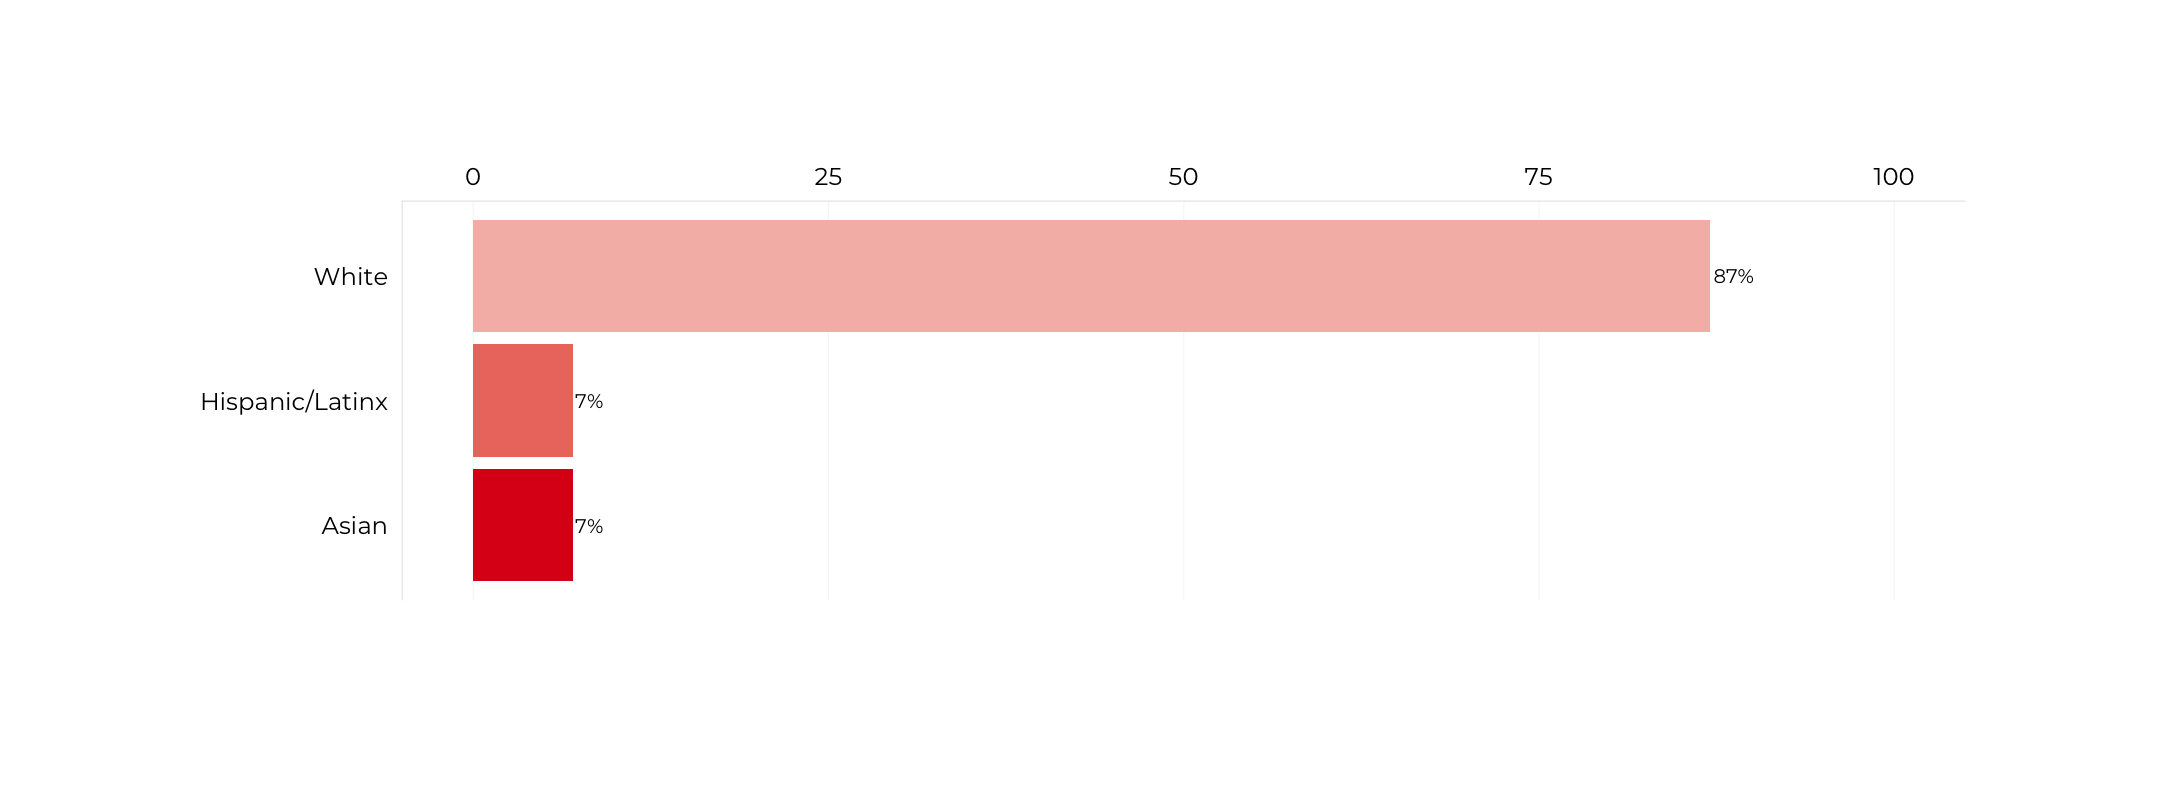 Graph about Racial Composition of Secretaries of Energy. More detailed text description below.